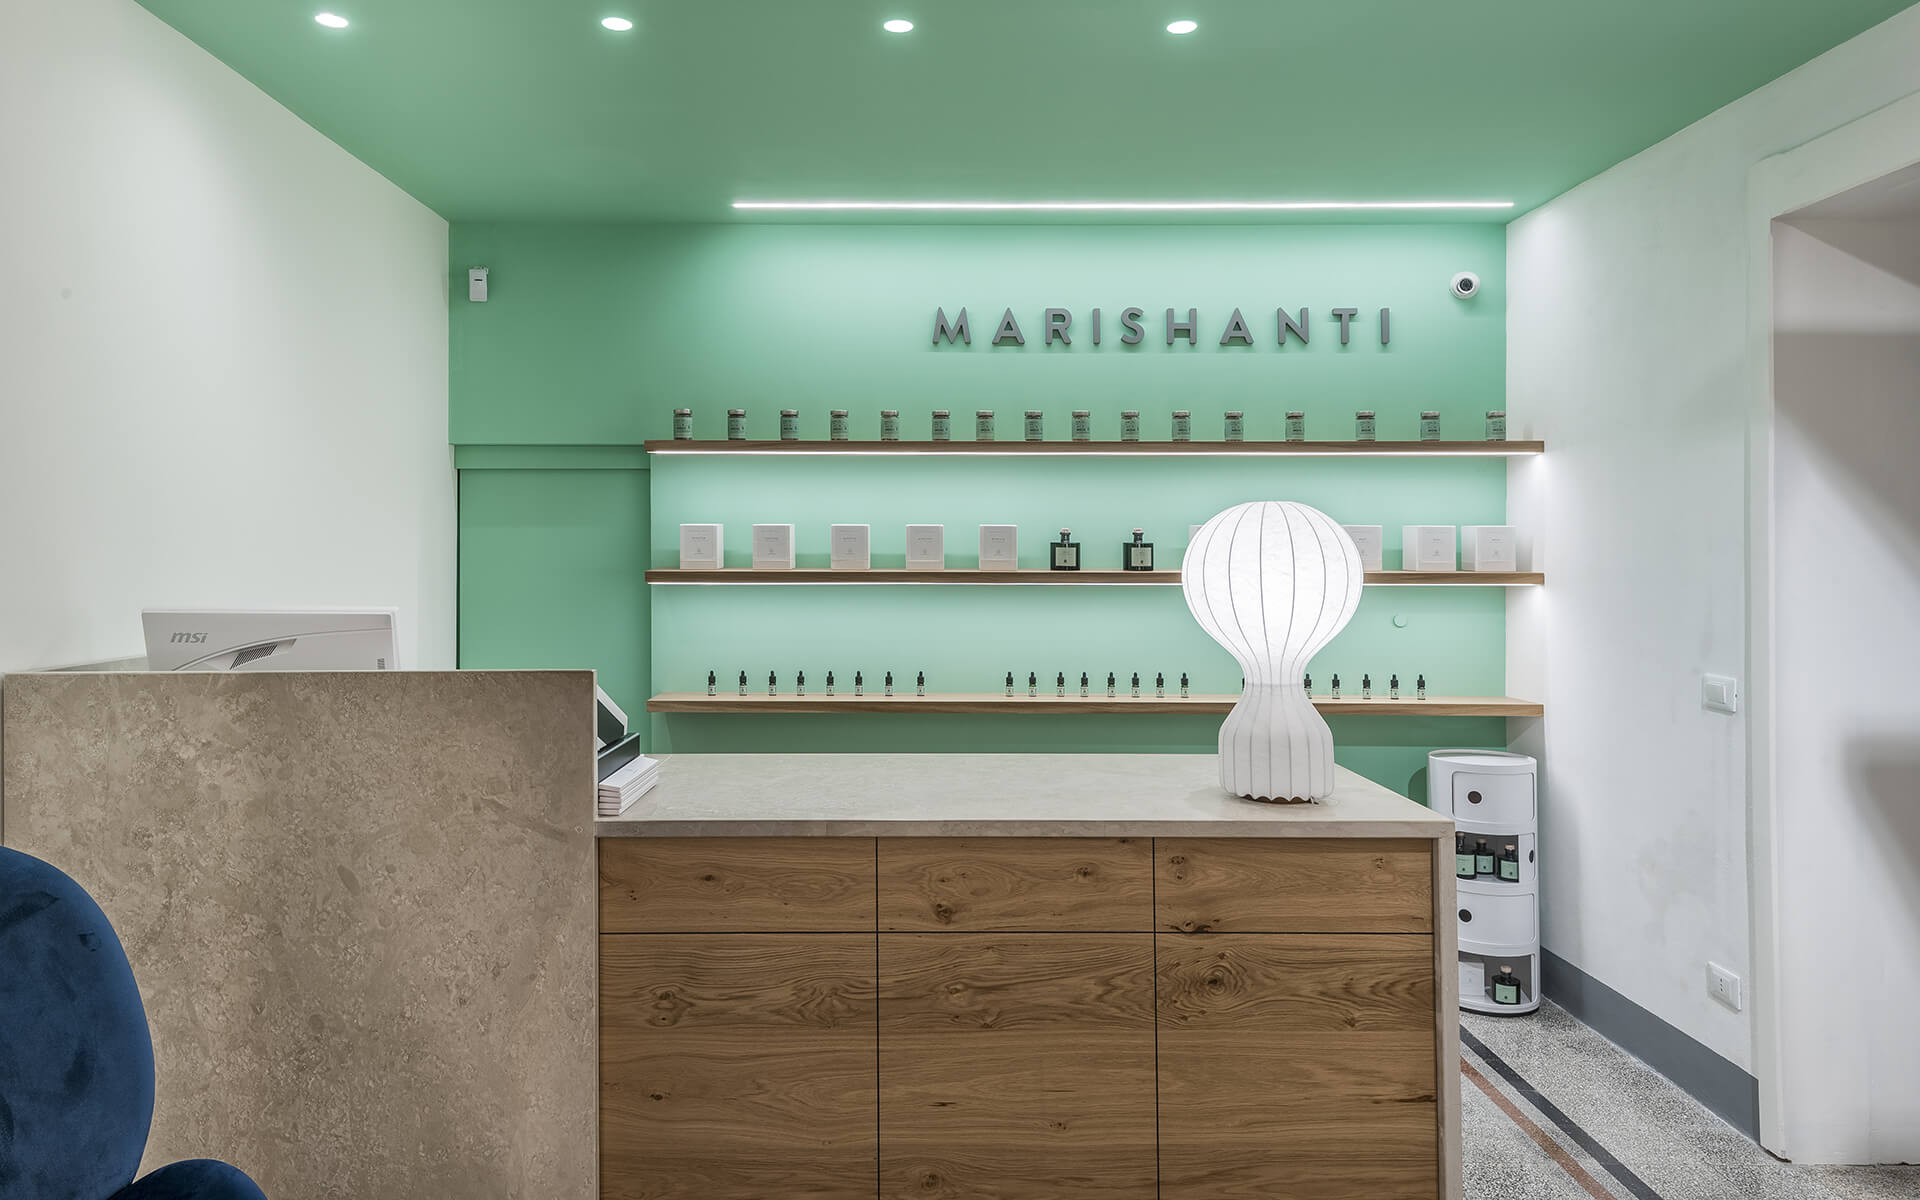 marishanti-boutique-noto-_0000s_0003_marishanti-3